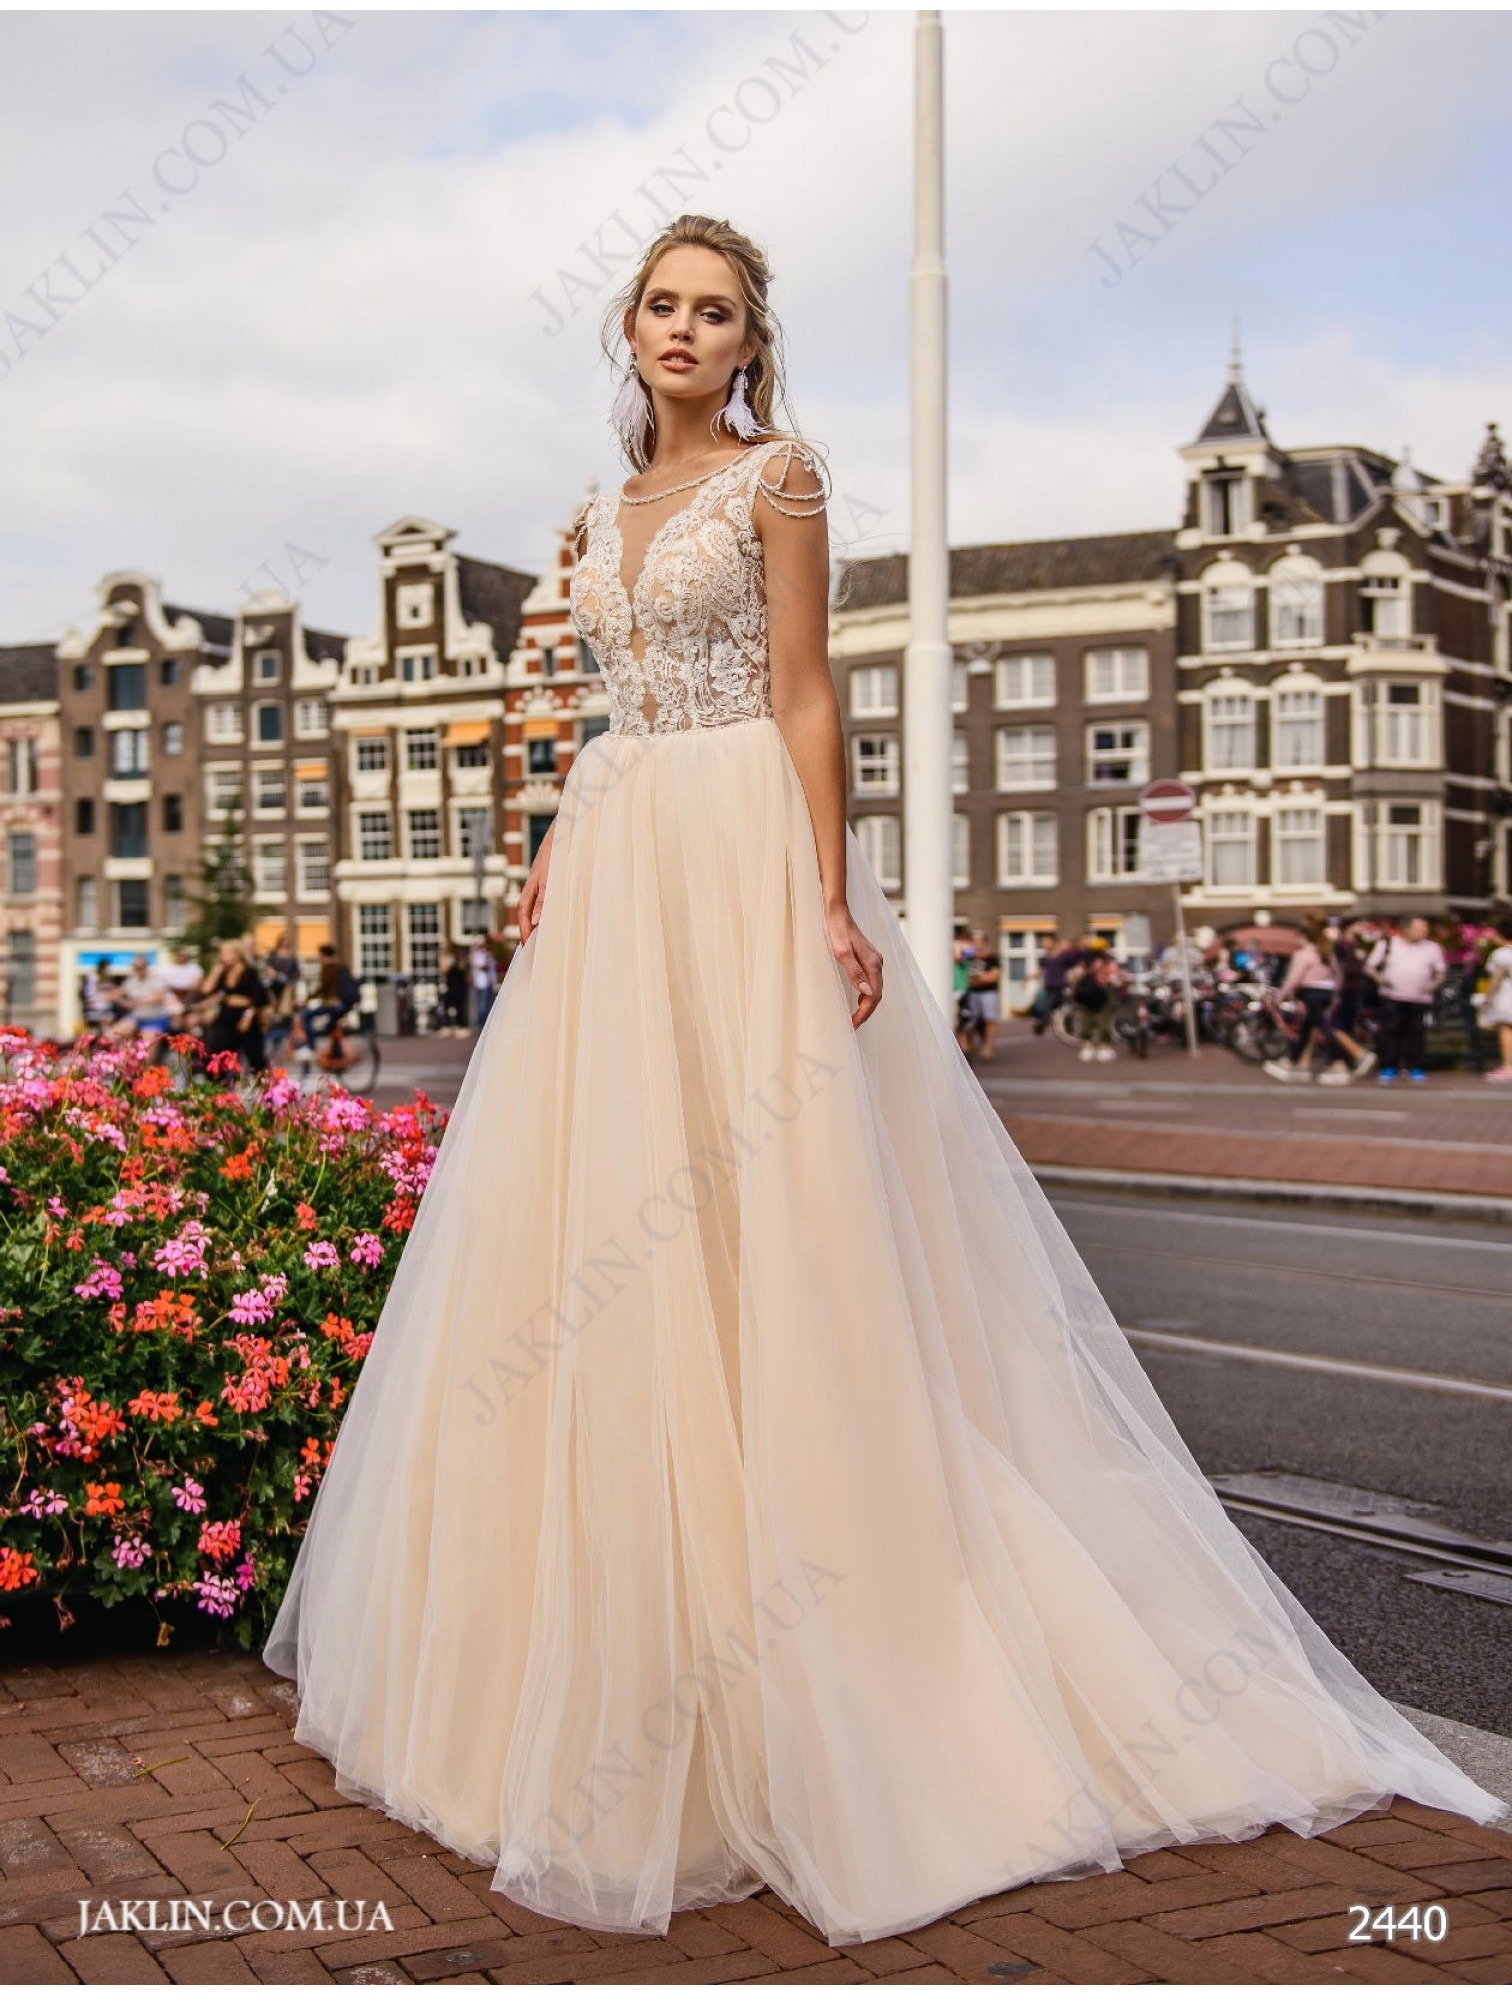 Wedding dress 2440